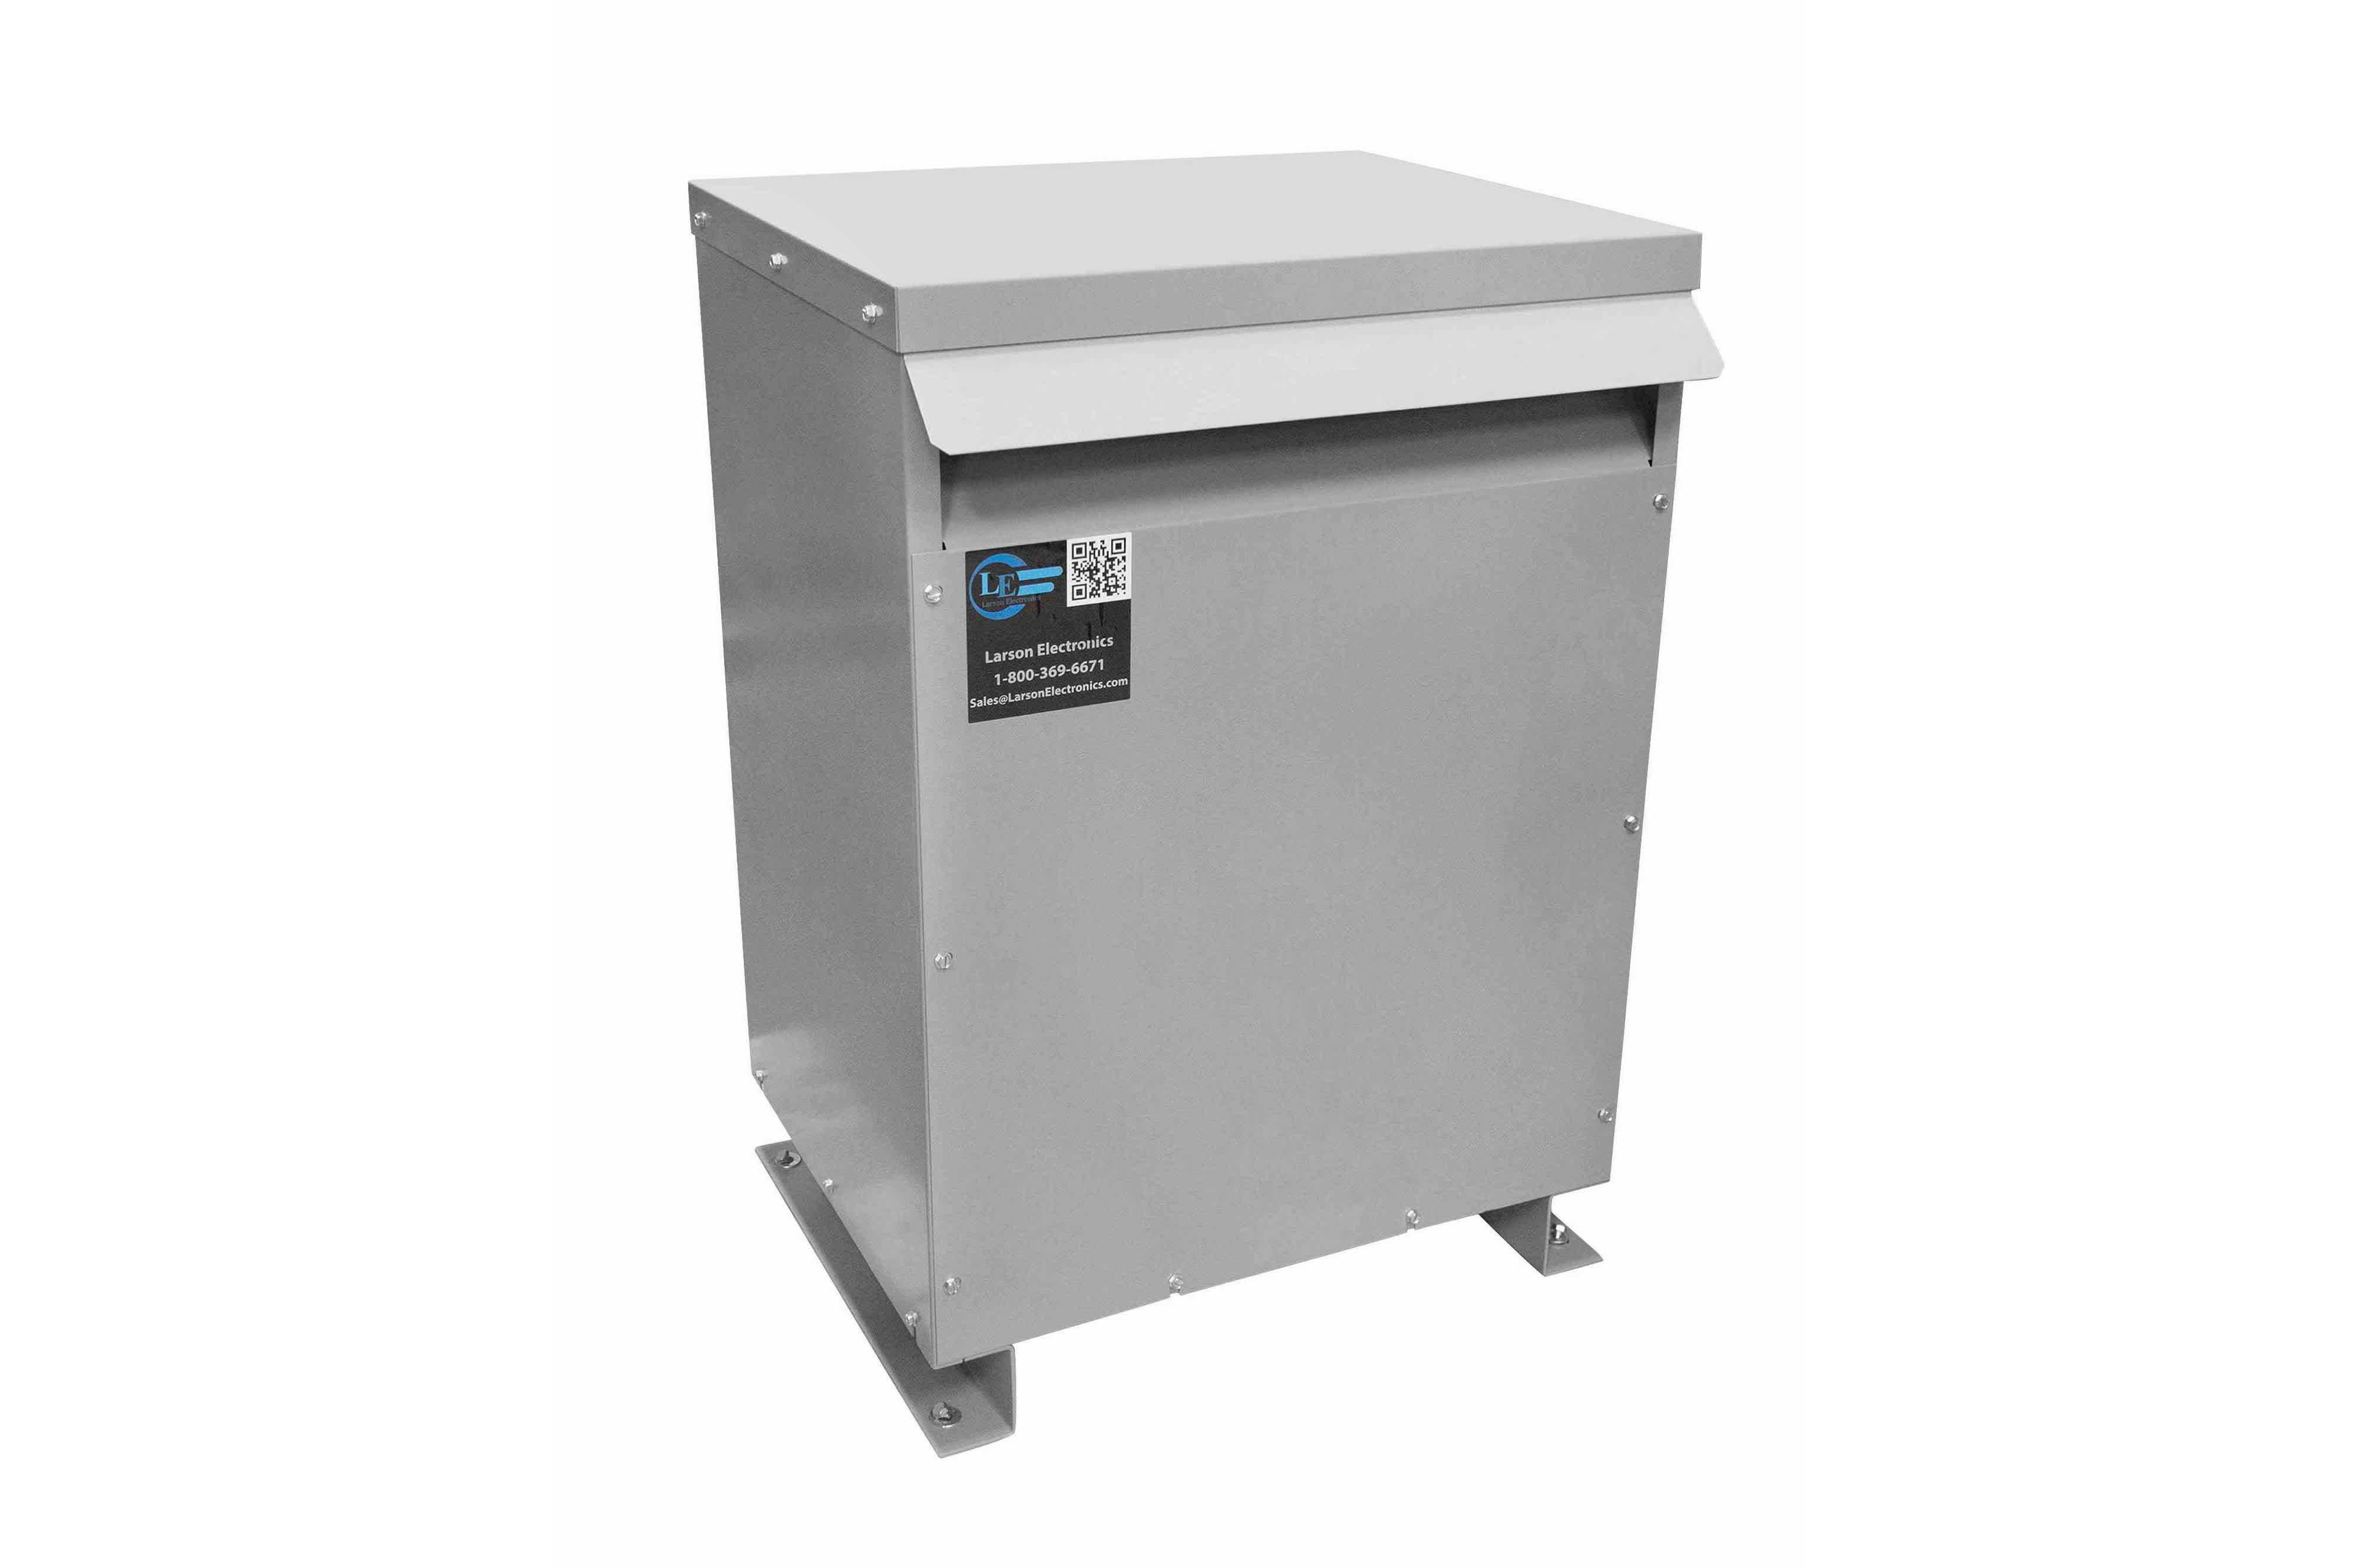 52.5 kVA 3PH Isolation Transformer, 460V Wye Primary, 380V Delta Secondary, N3R, Ventilated, 60 Hz